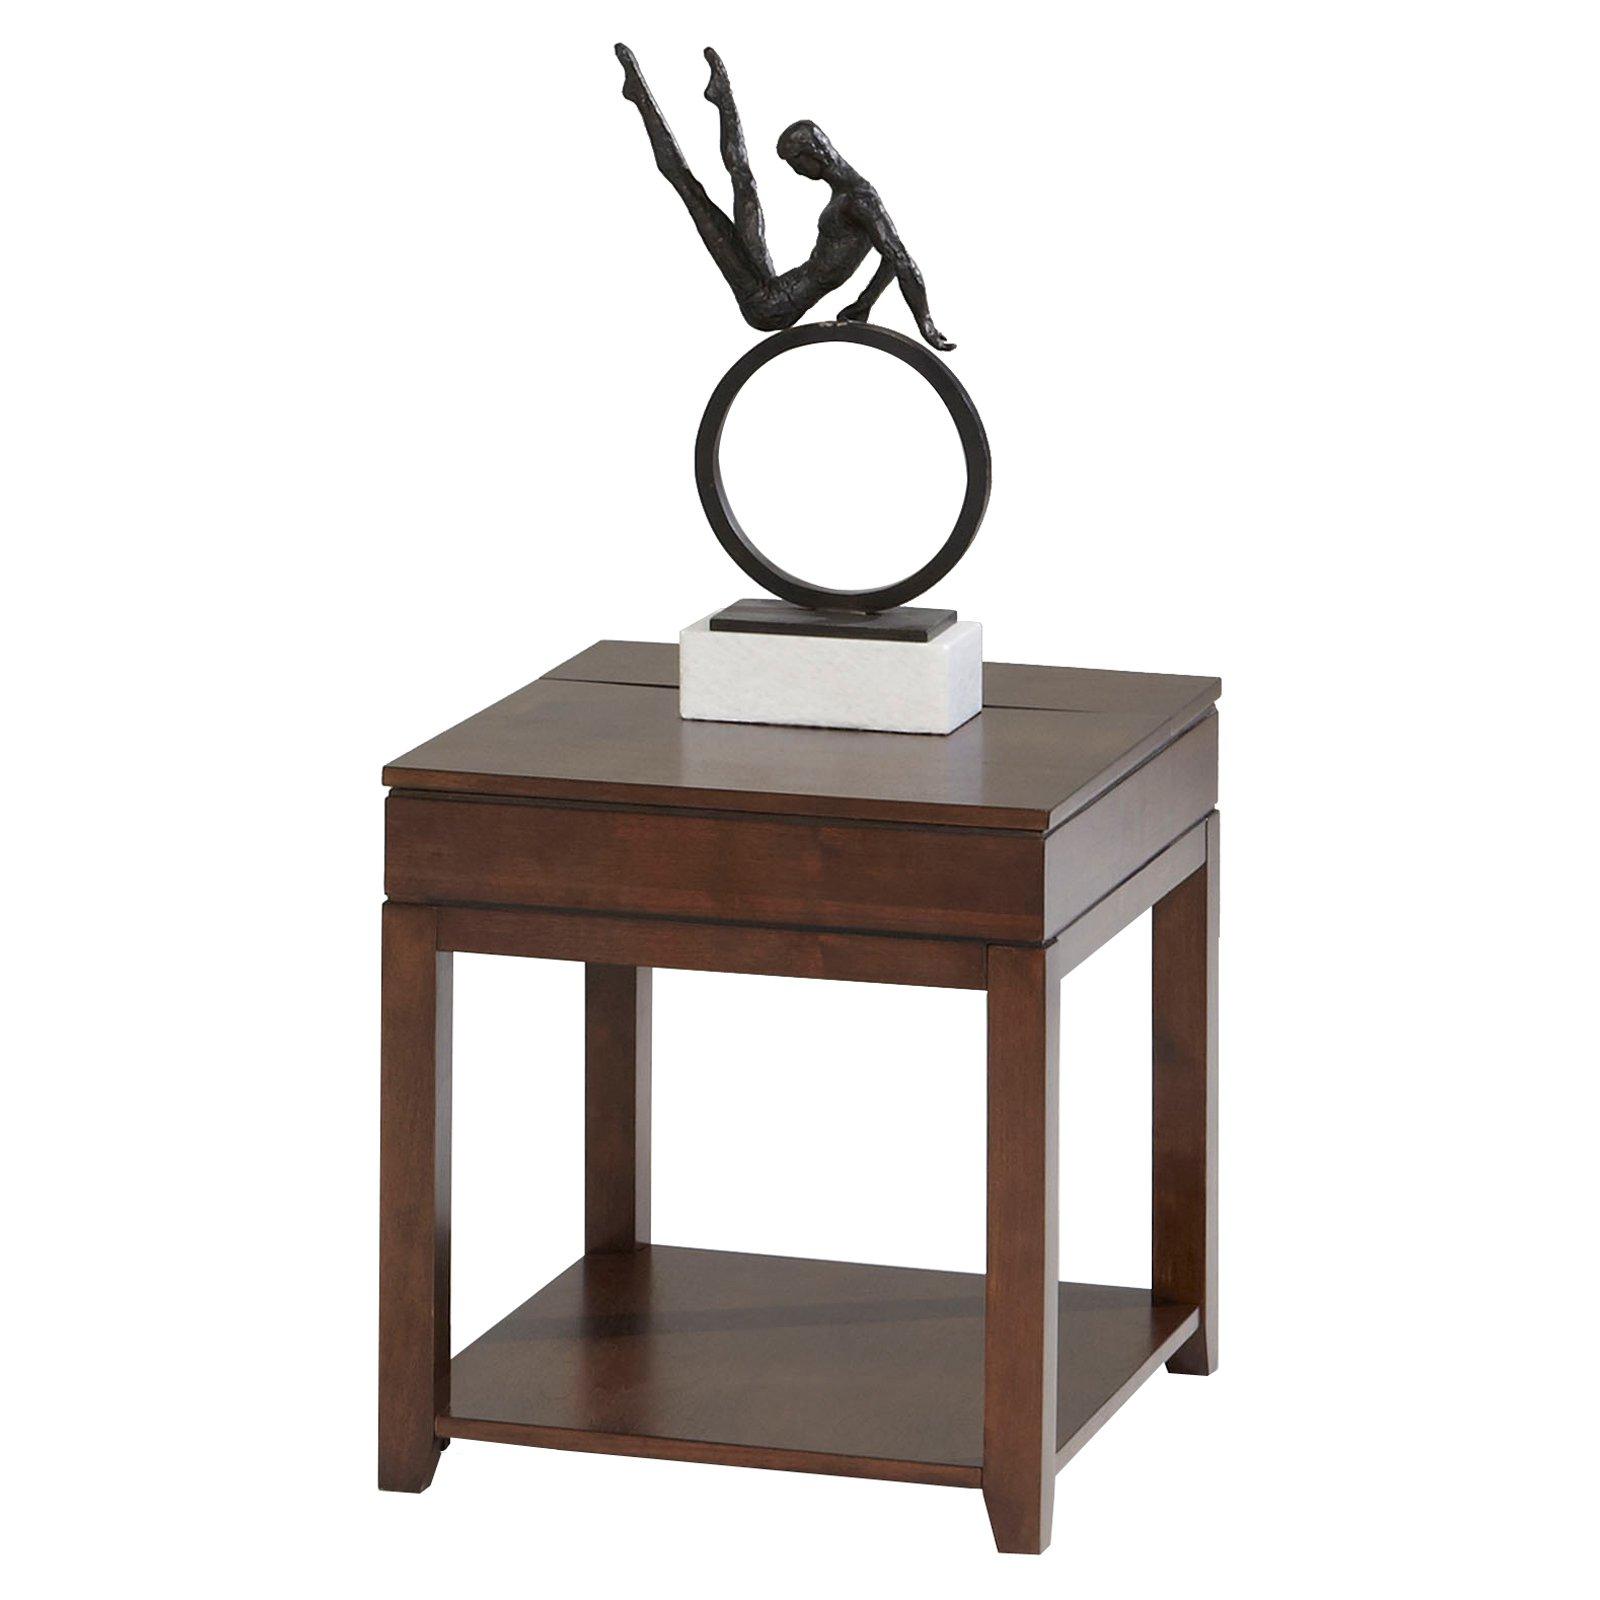 Progressive Furniture Daytona End Table